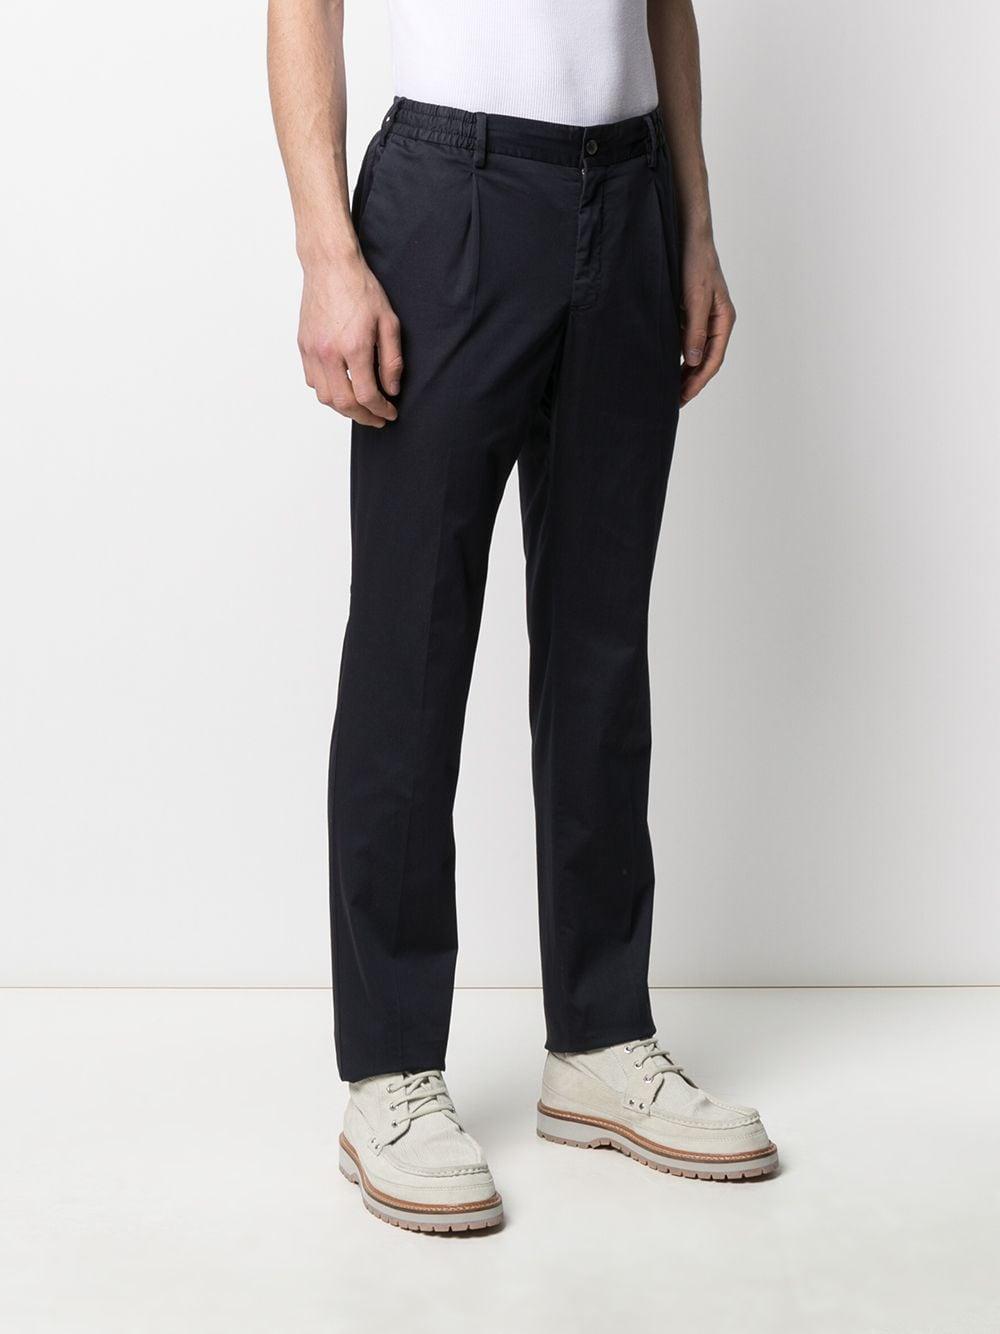 Pantaloni chino blu in misto cotone PT01 | Pantaloni | COWTJ1ZA0TVL-NU050374